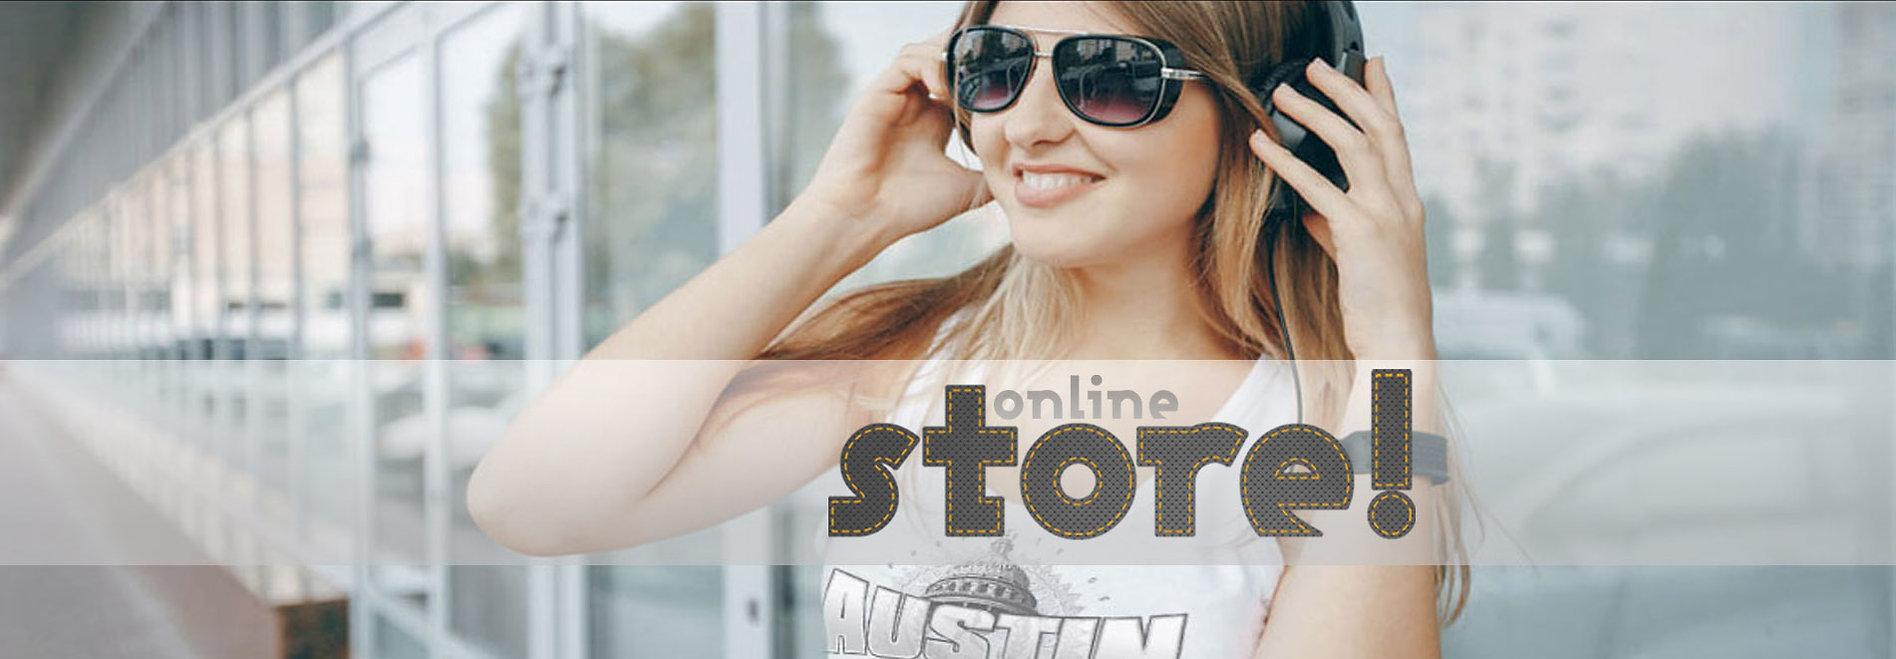 online store girl headphones.jpg